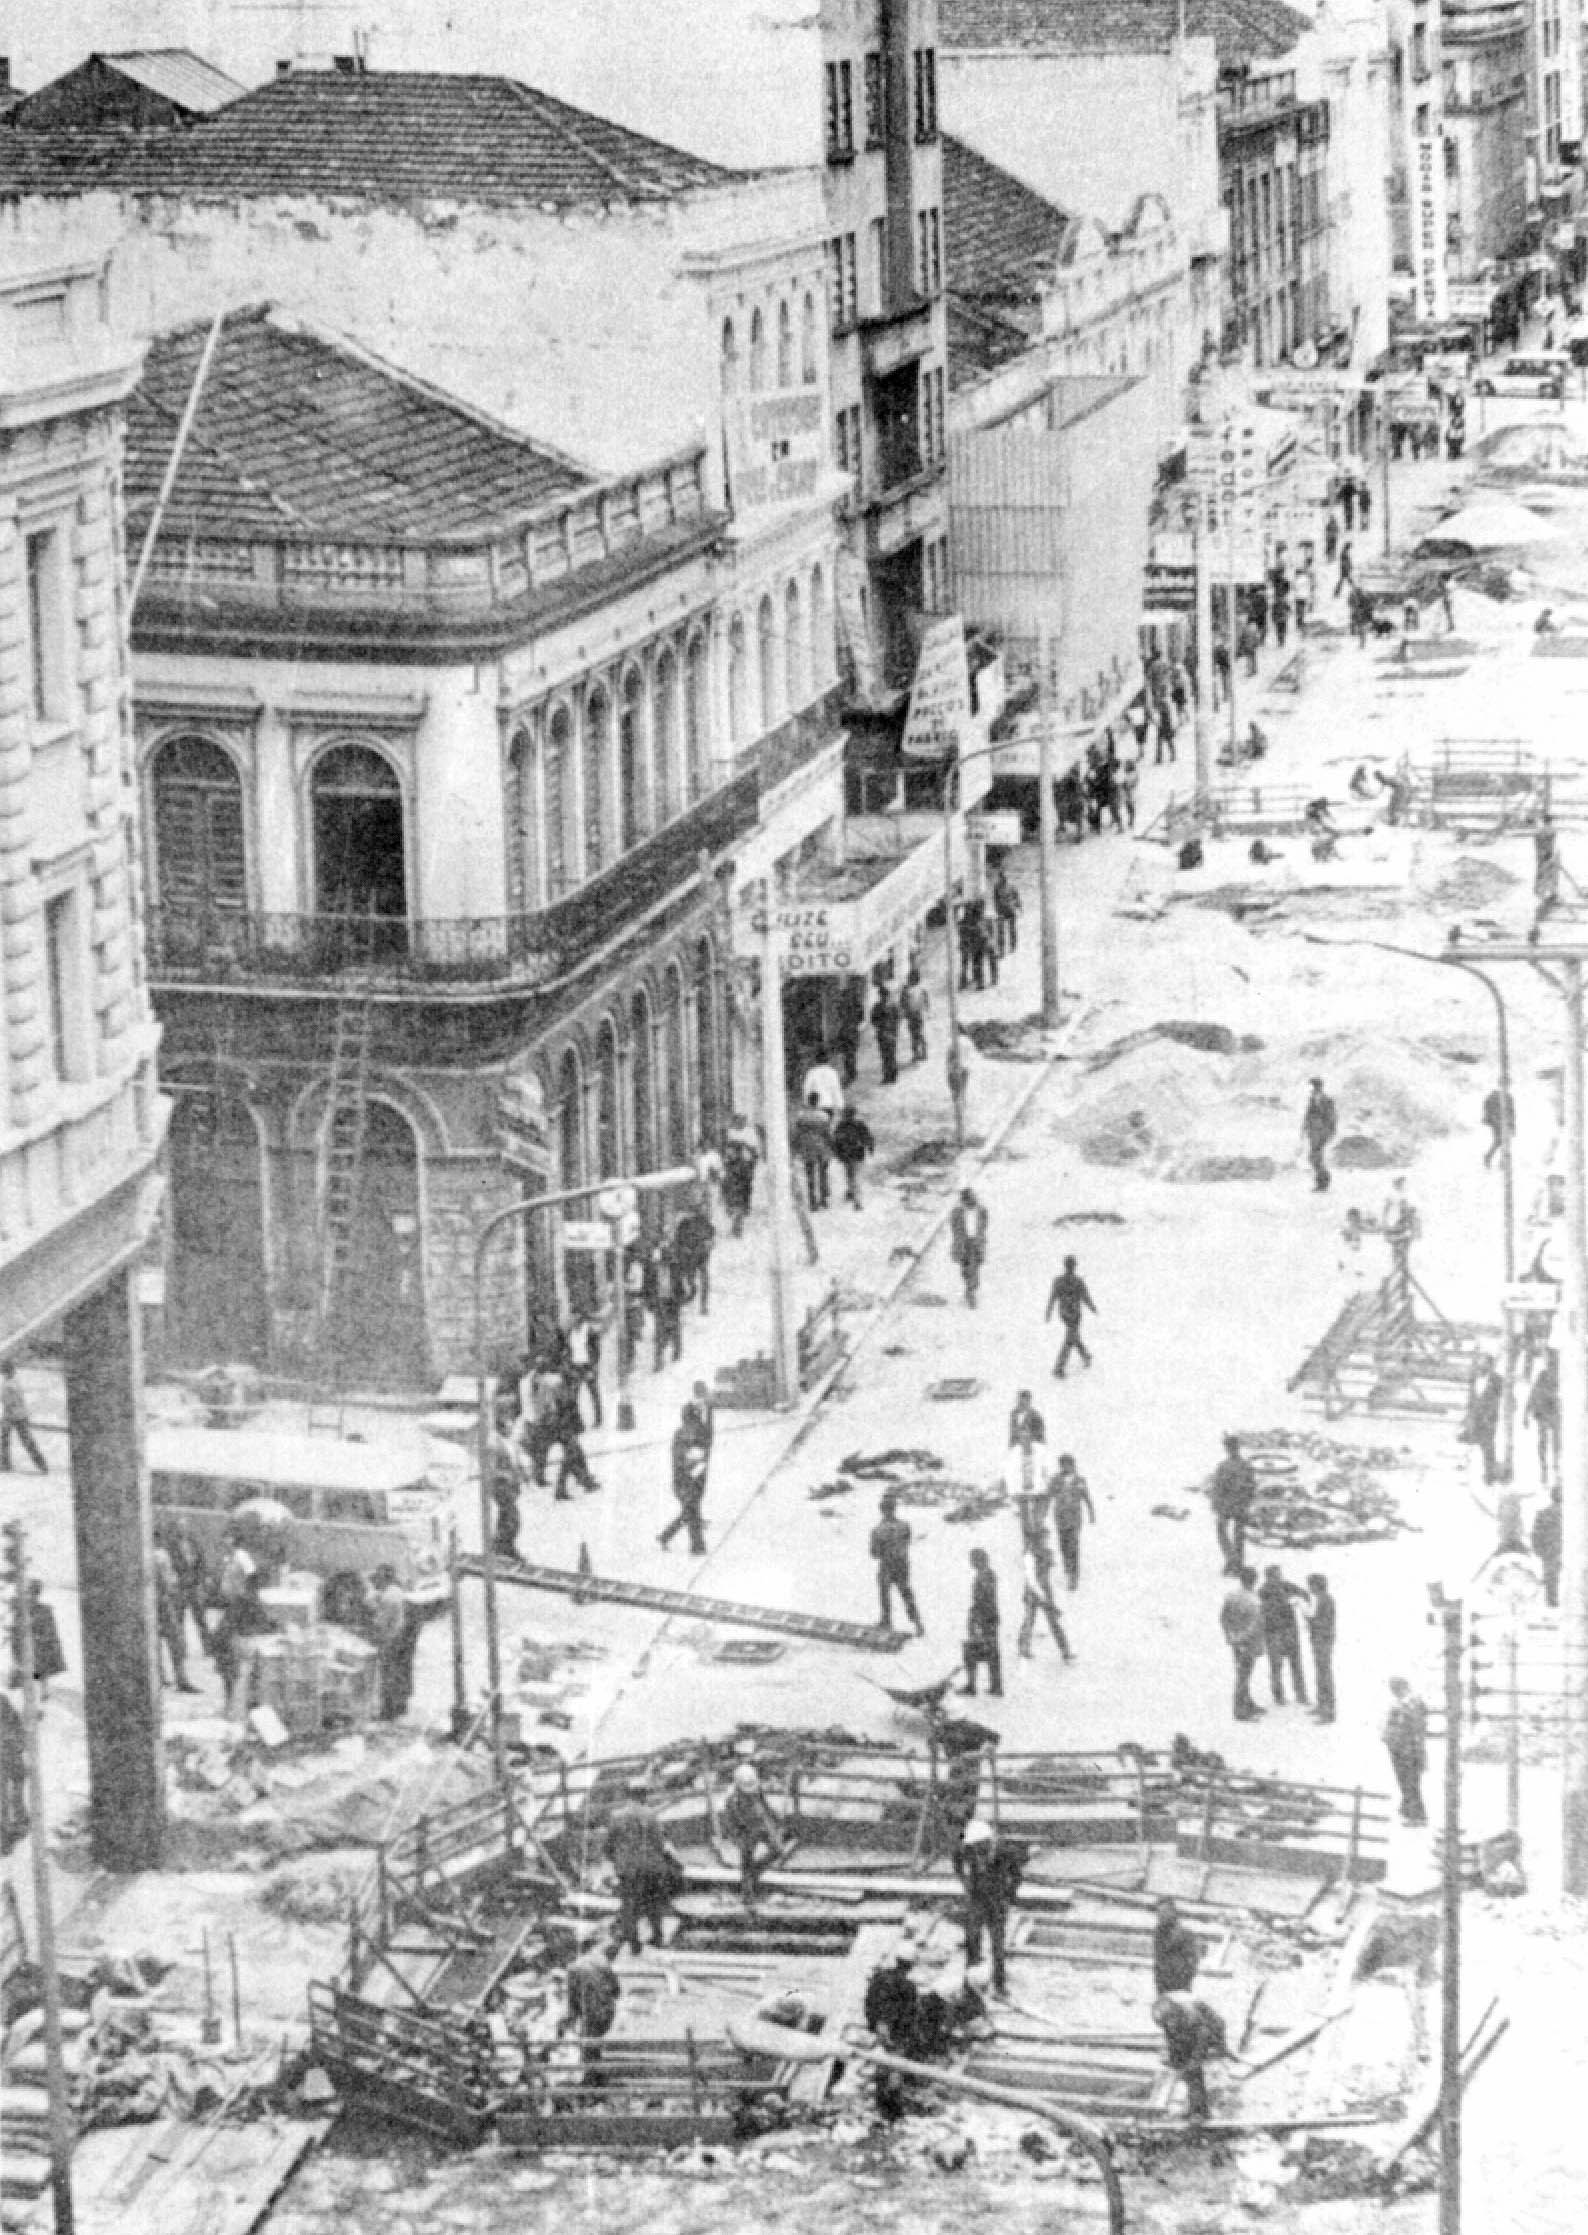 Obras do cal?ad?o da Rua XV, 1972